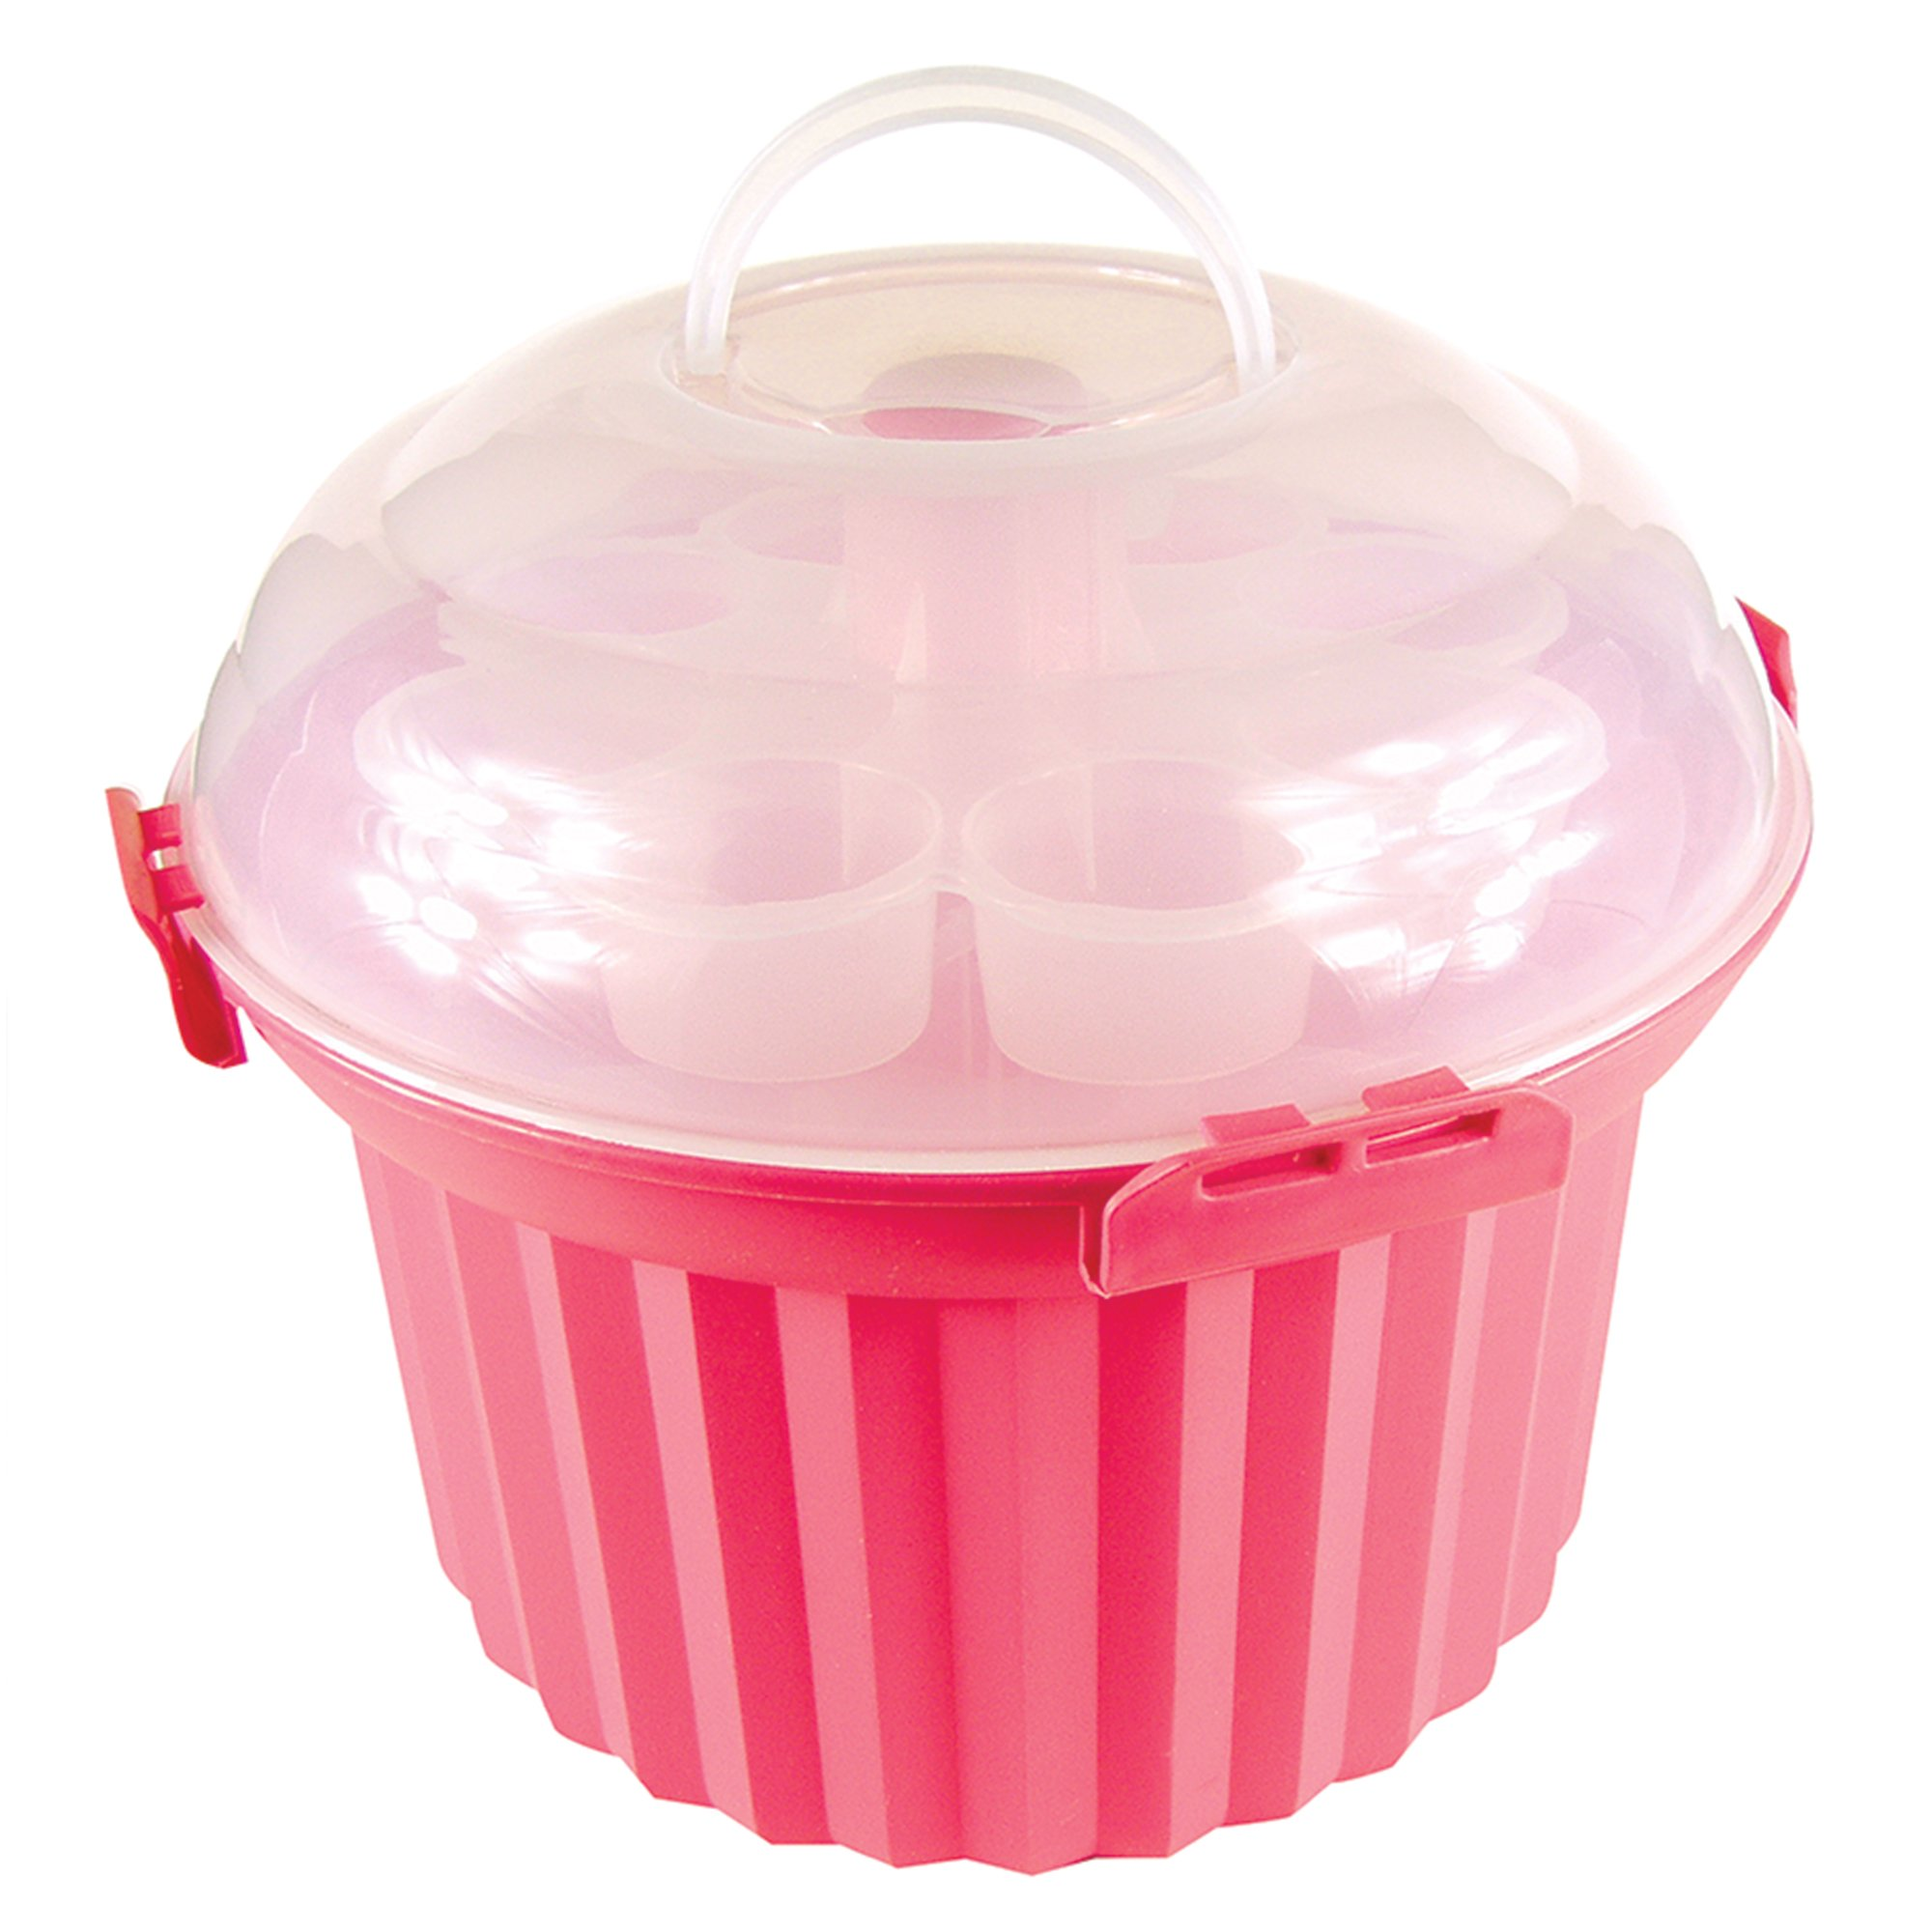 Fox Run 6973 Cupcake Carousel, Plastic, 24-Cups, Pink by Fox Run